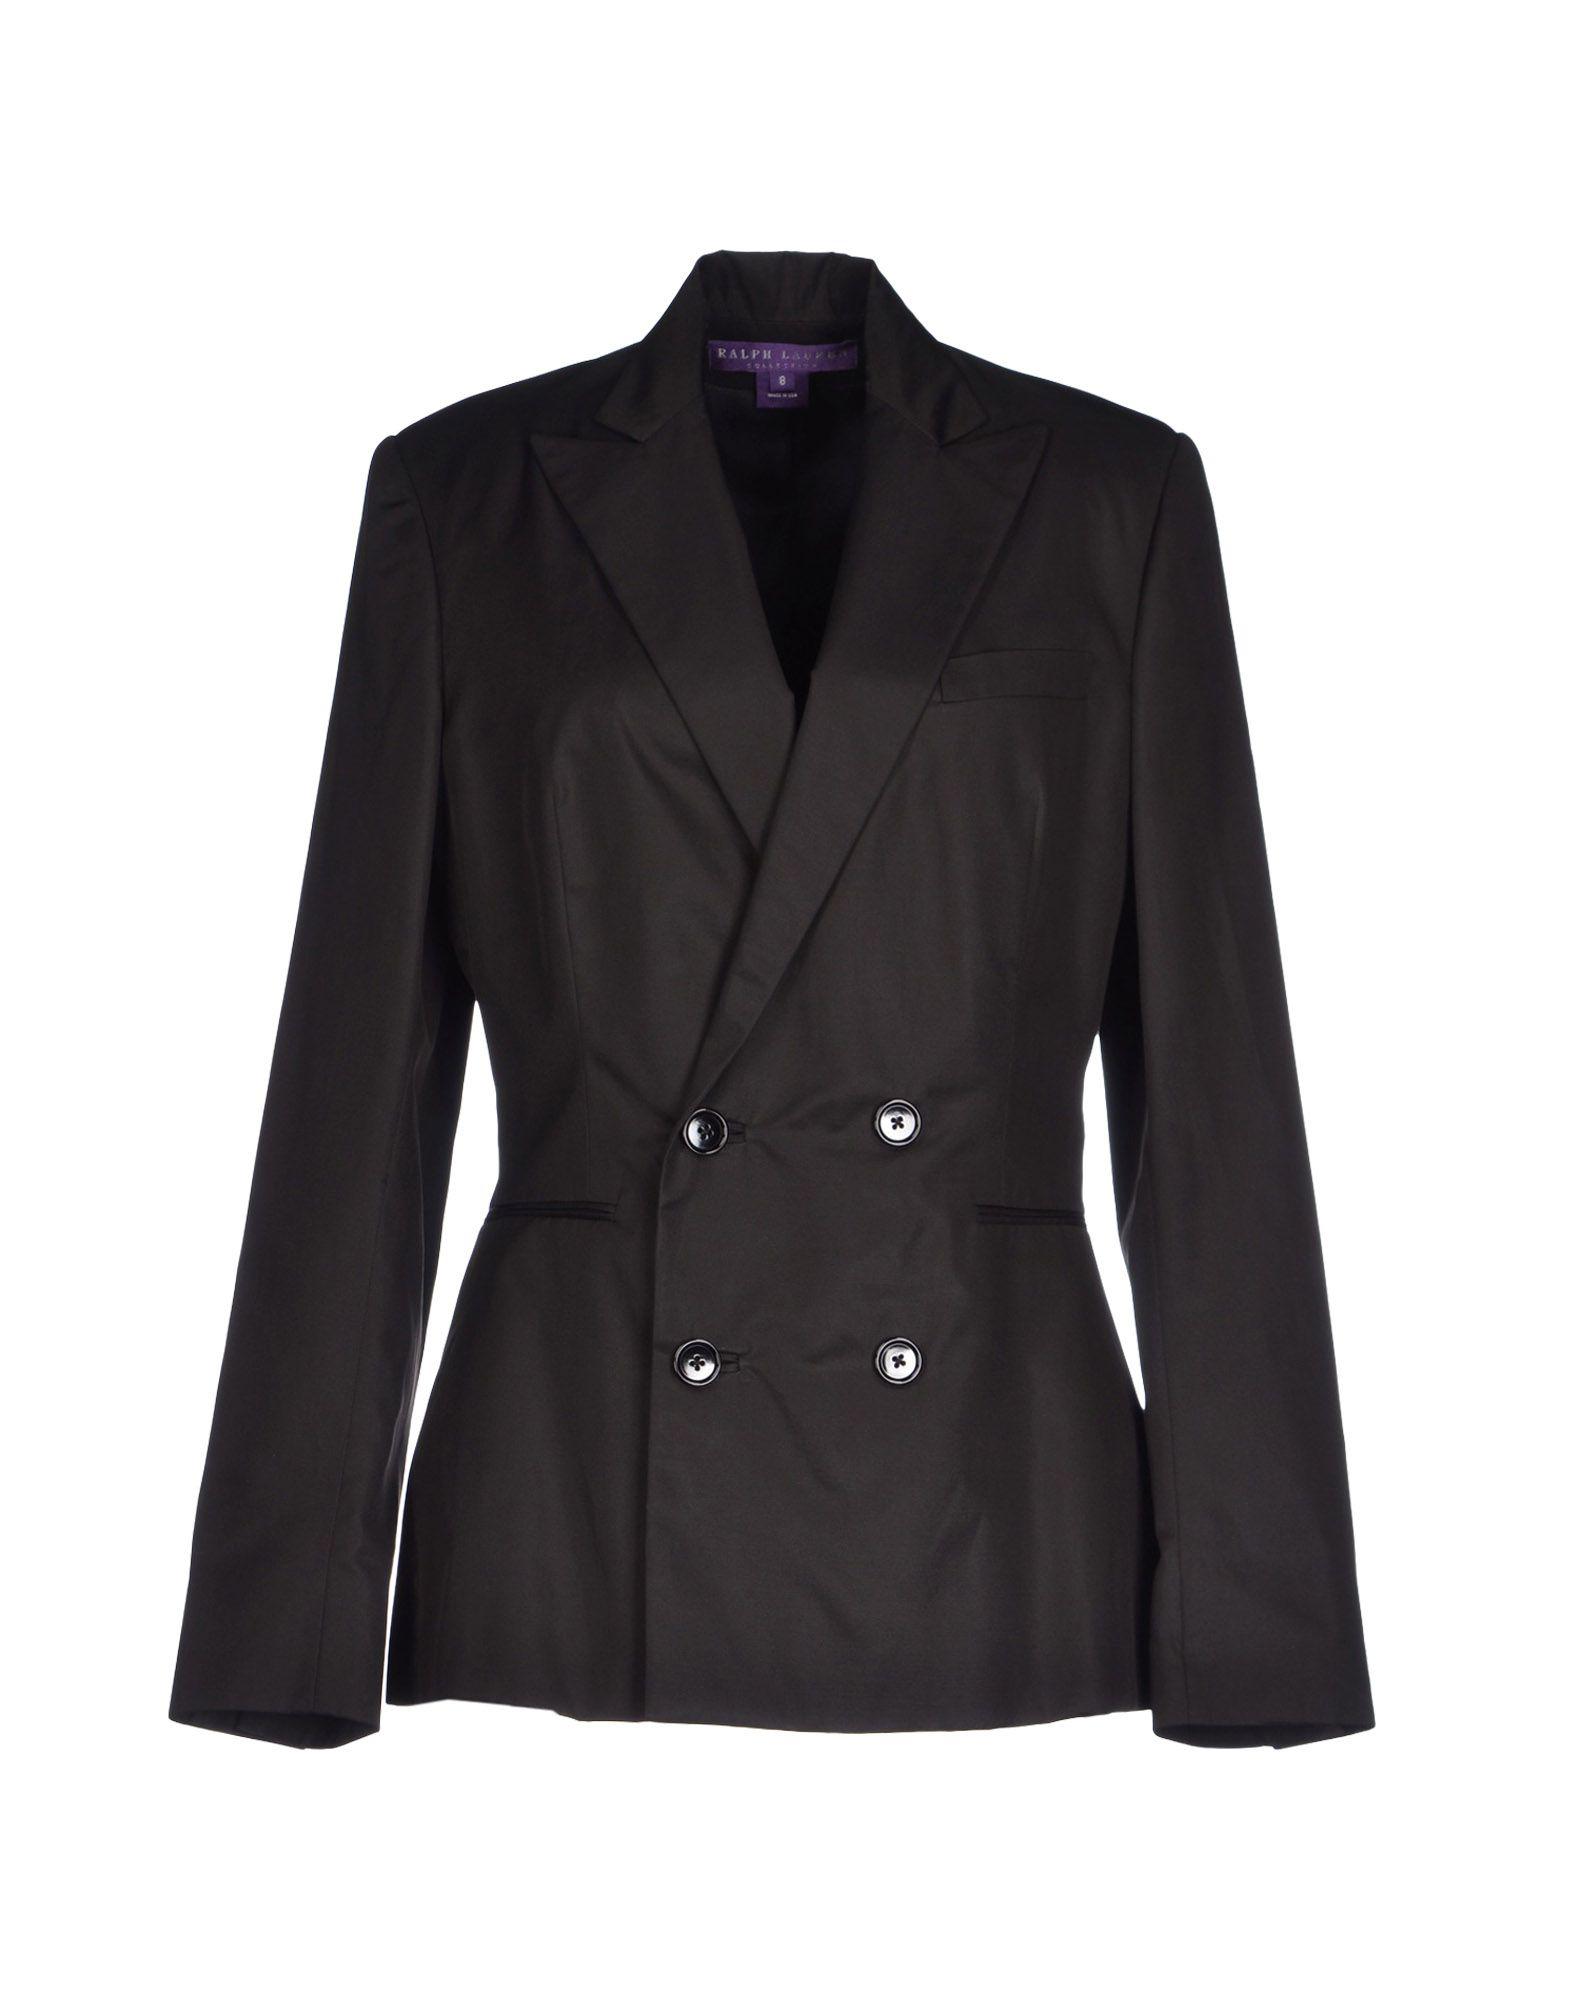 ralph lauren collection blazer in black lyst. Black Bedroom Furniture Sets. Home Design Ideas